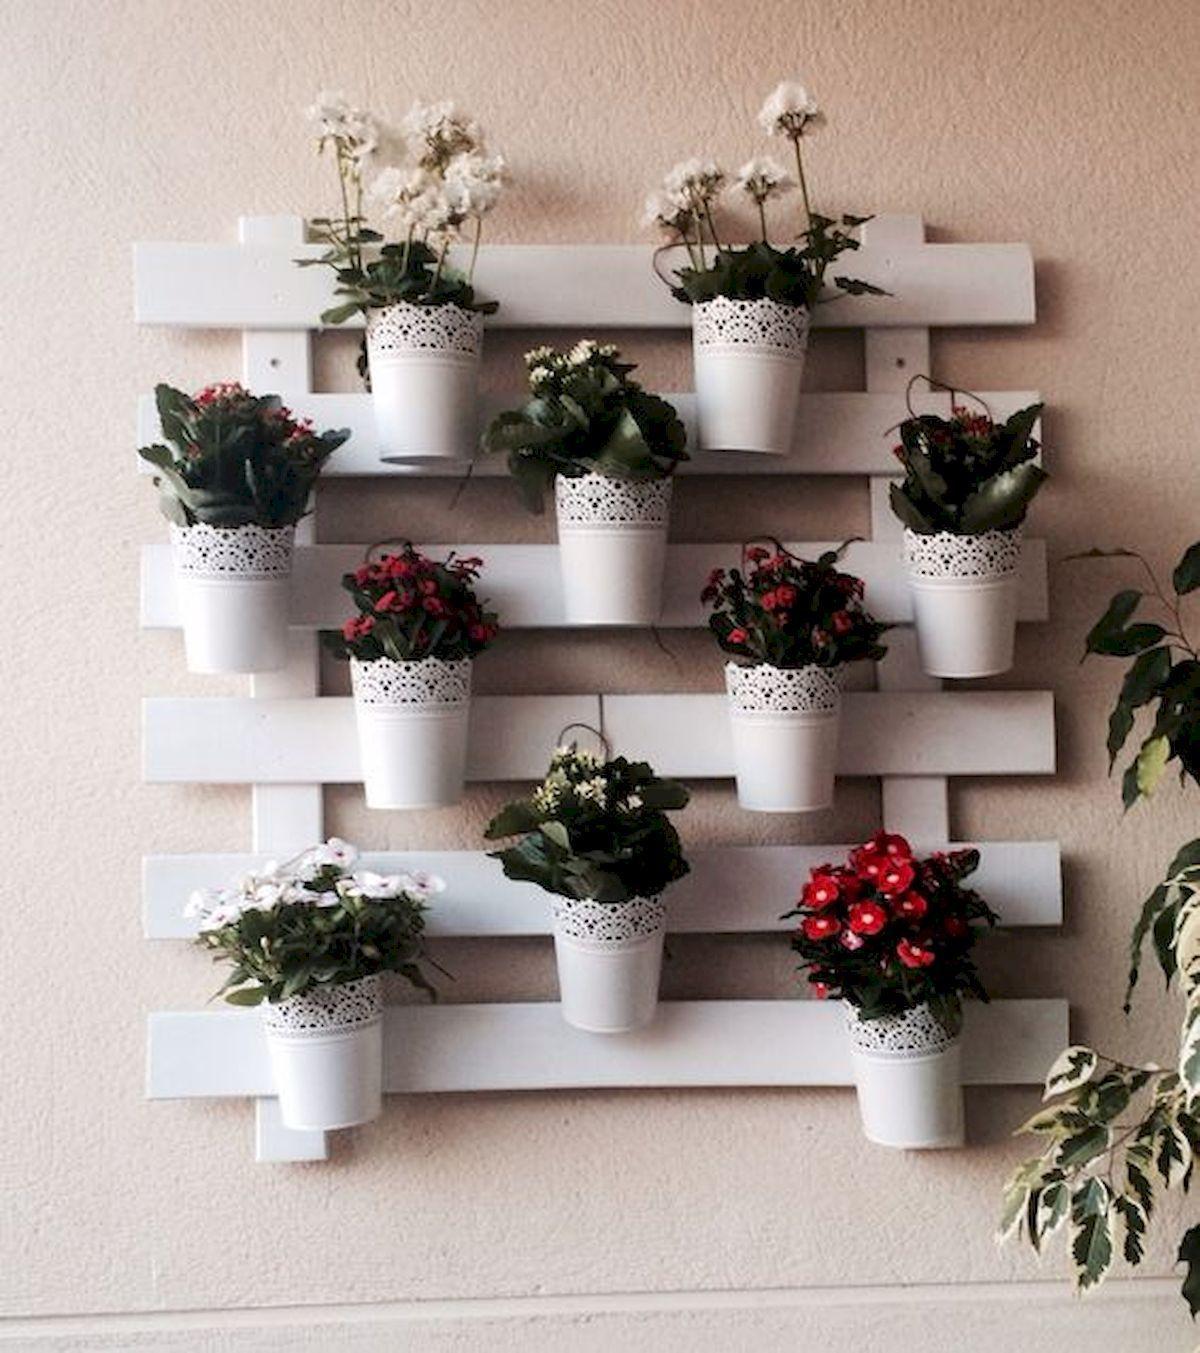 Beautiful Container Gardening Ideas: 100 Beautiful DIY Pots And Container Gardening Ideas (21